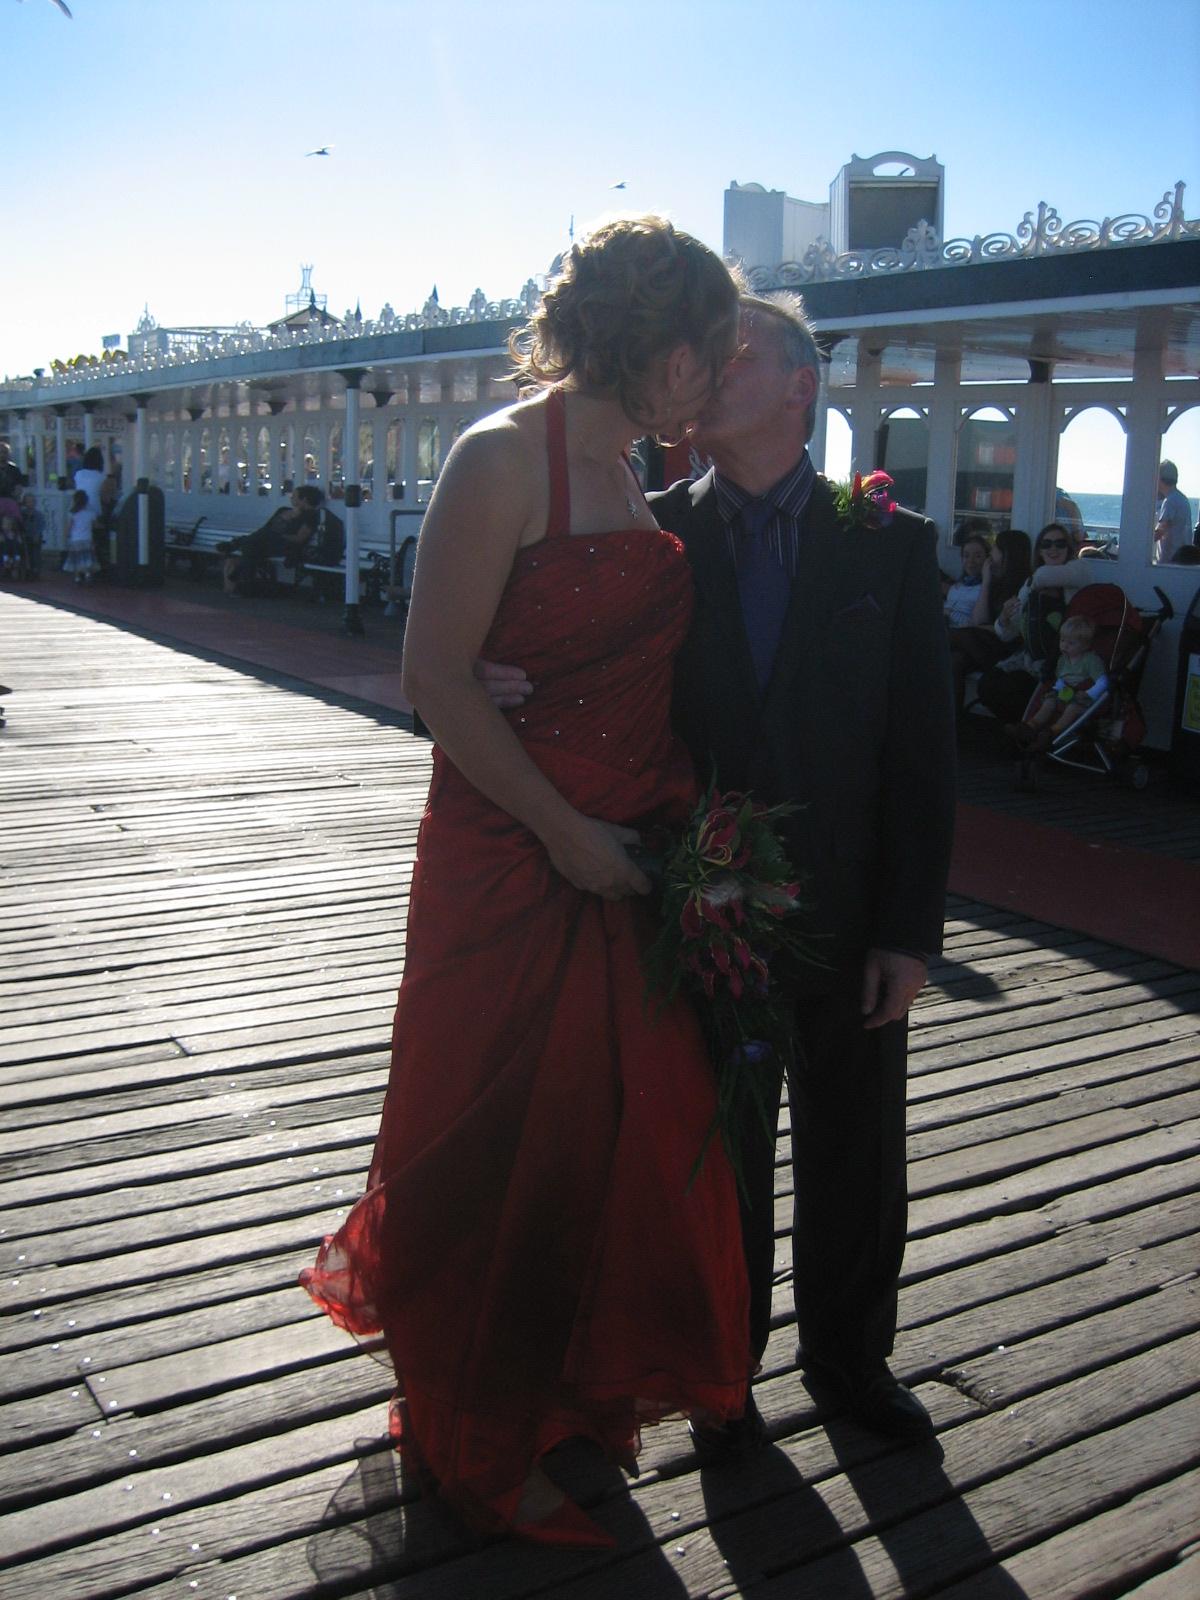 2013-07-08-Weddingkiss.jpg